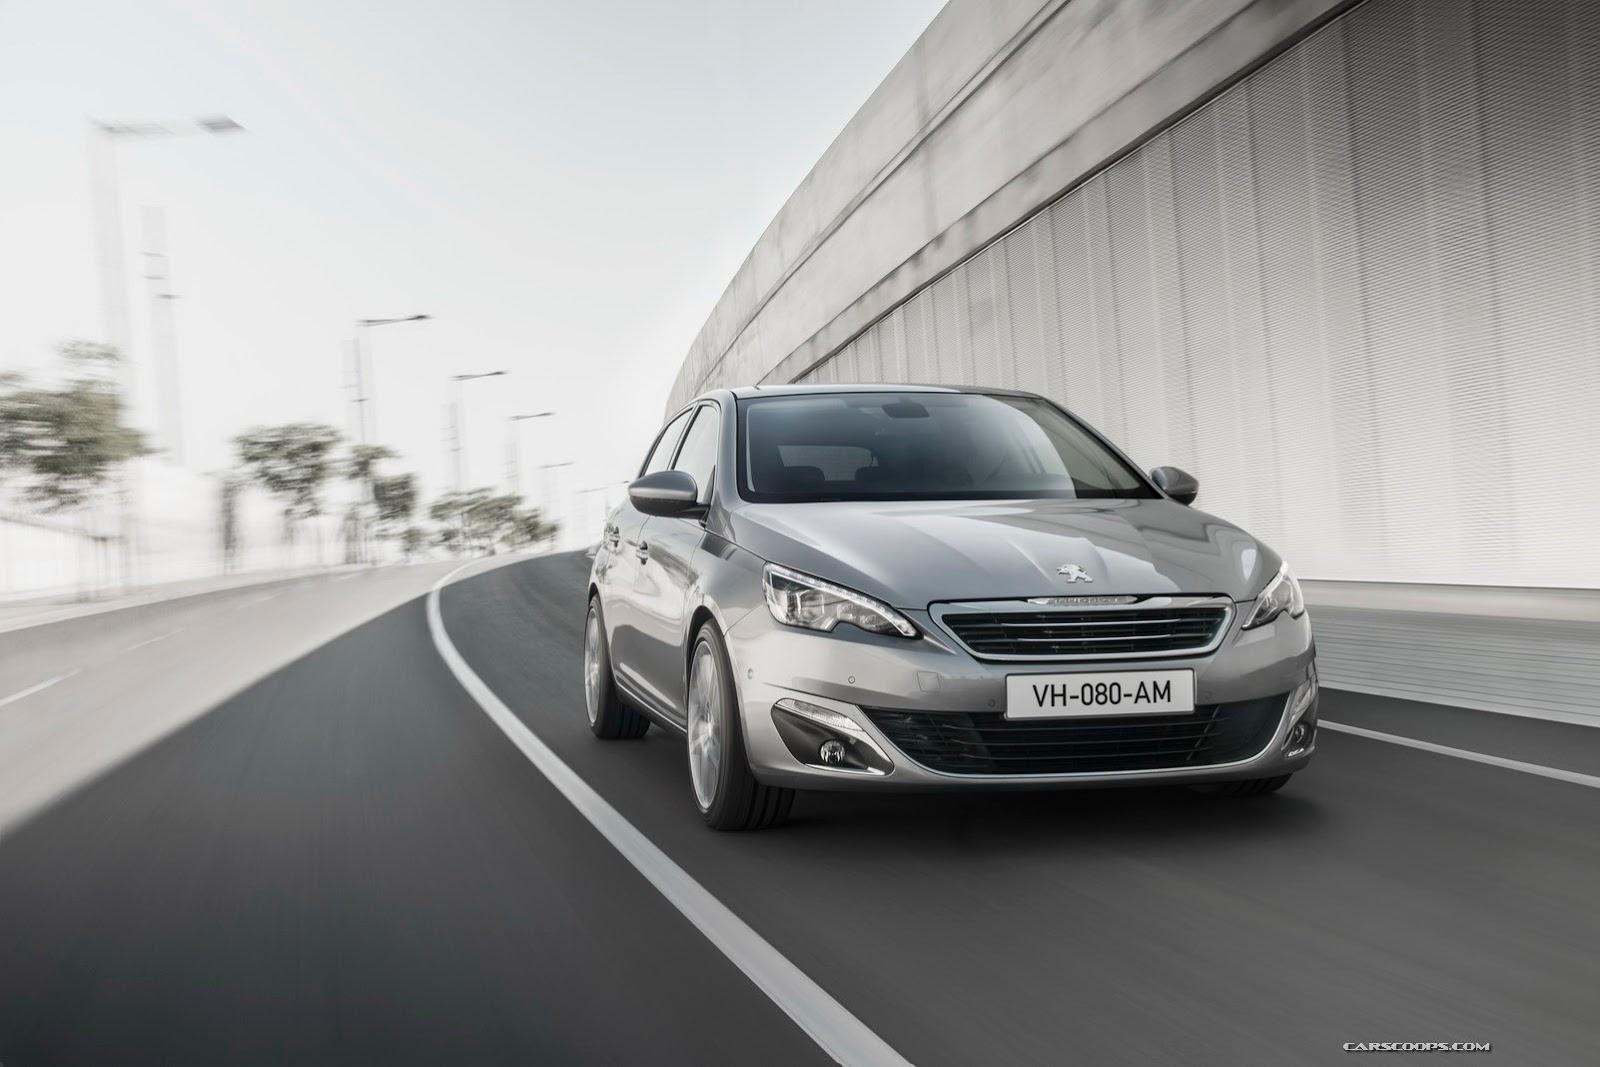 2014-Peugeot-308-Hatch-Carscoops-79%25255B2%25255D.jpg